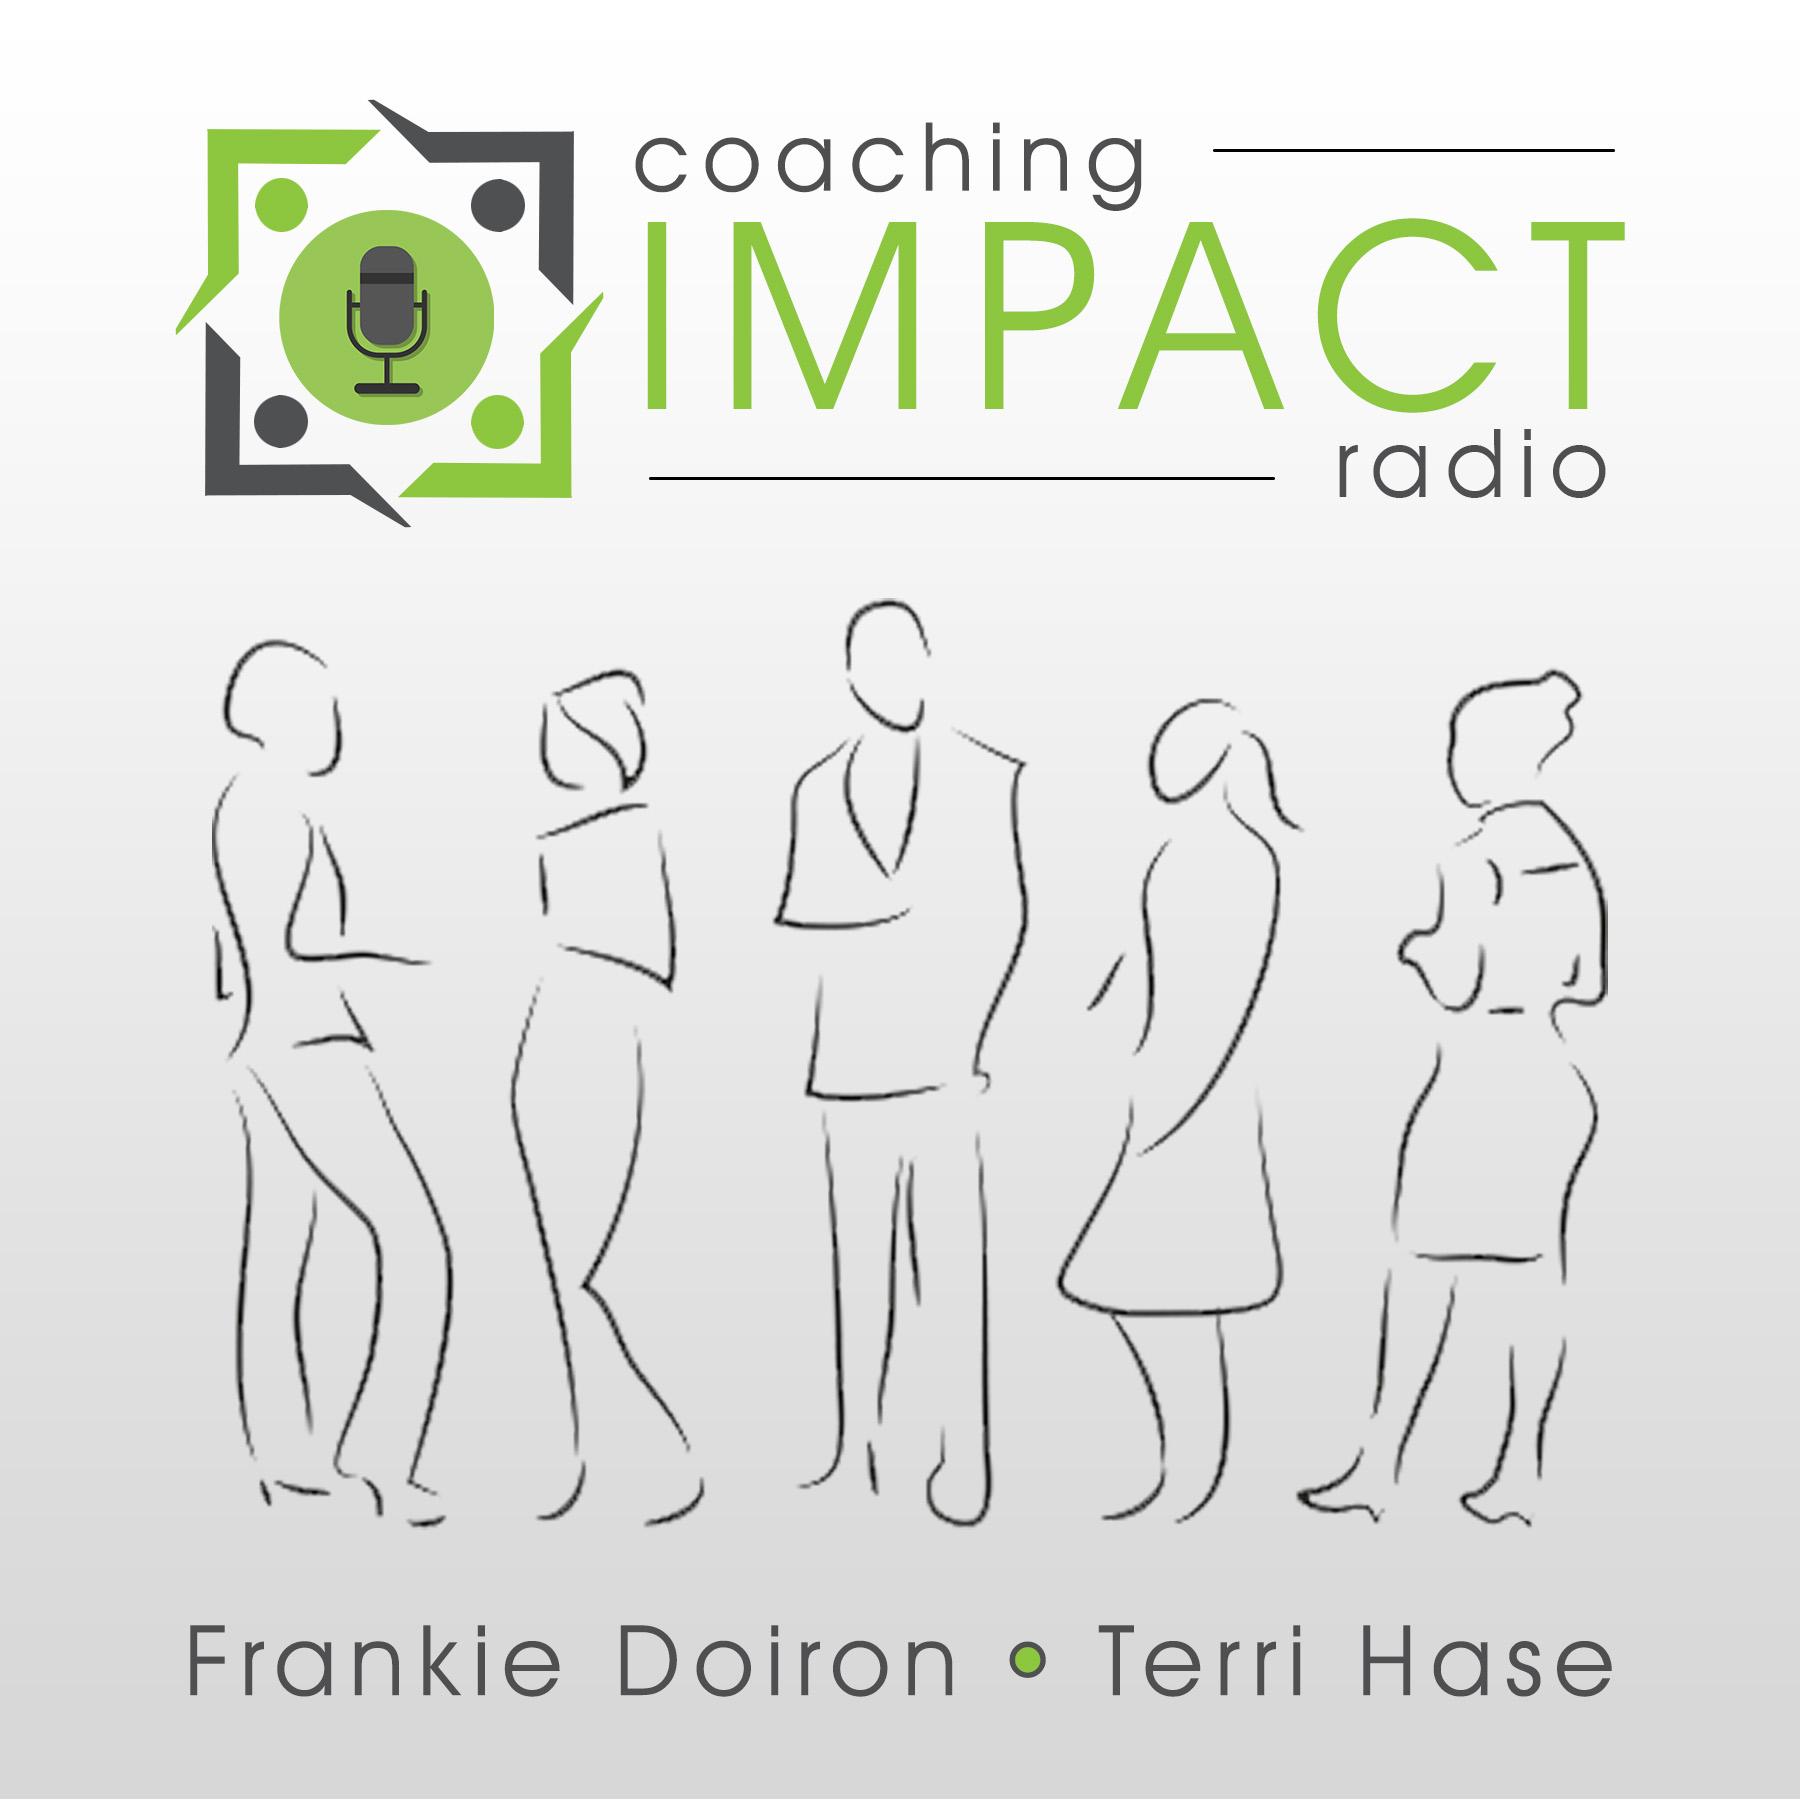 Coaching Impact Radio